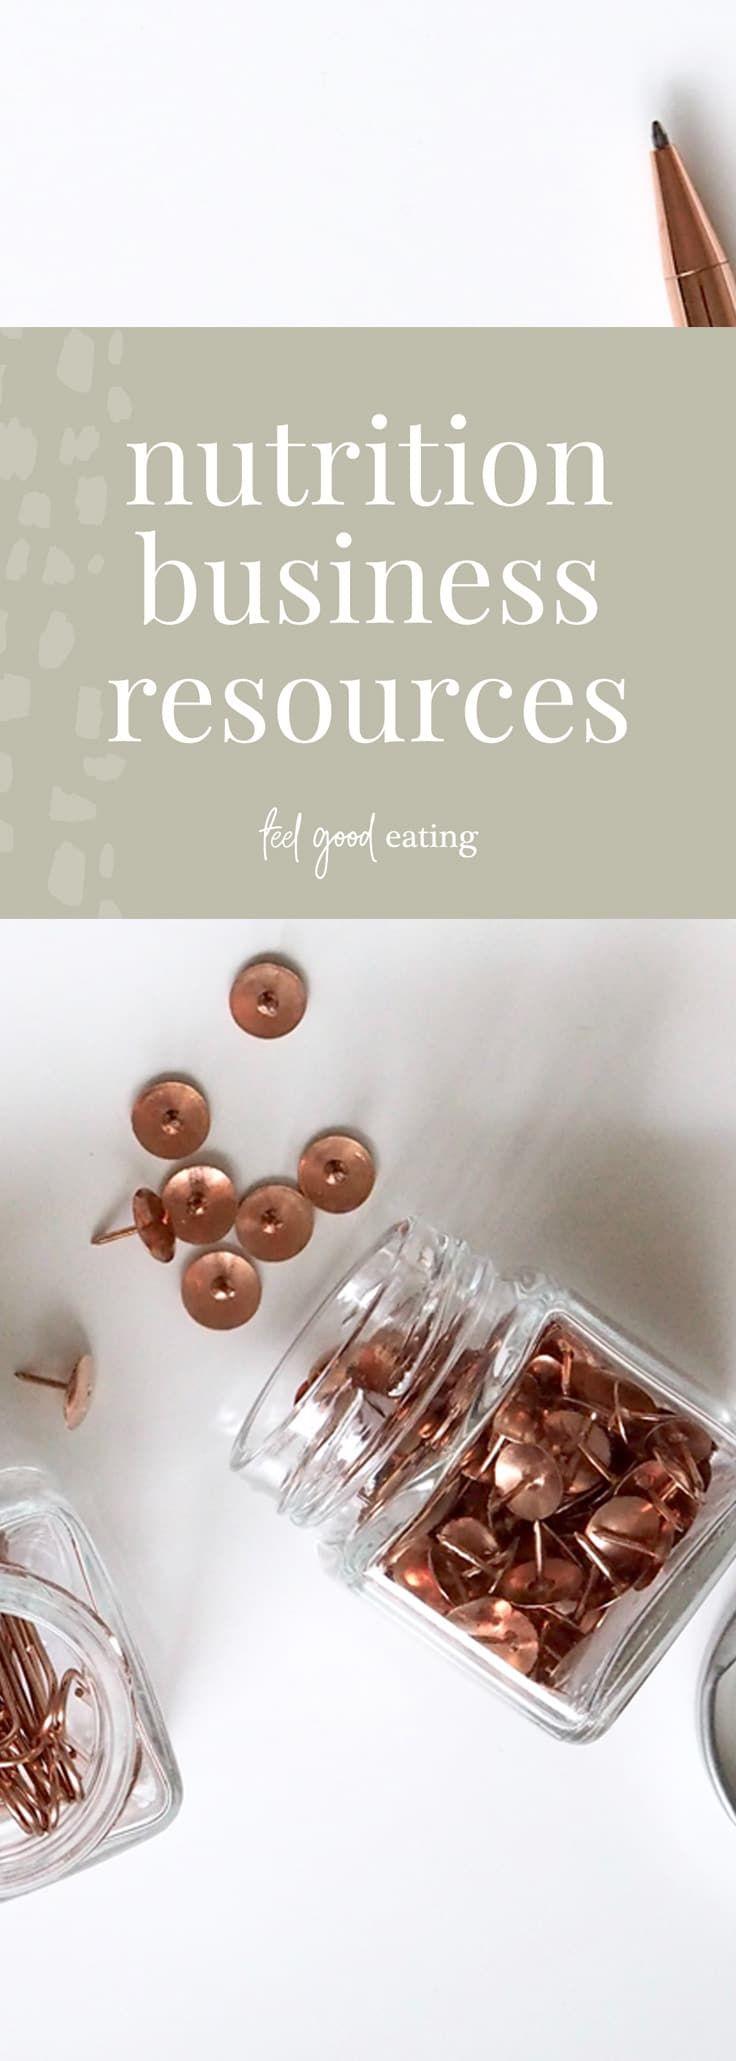 Nutrition Business Resources Diet, nutrition, Nutrition